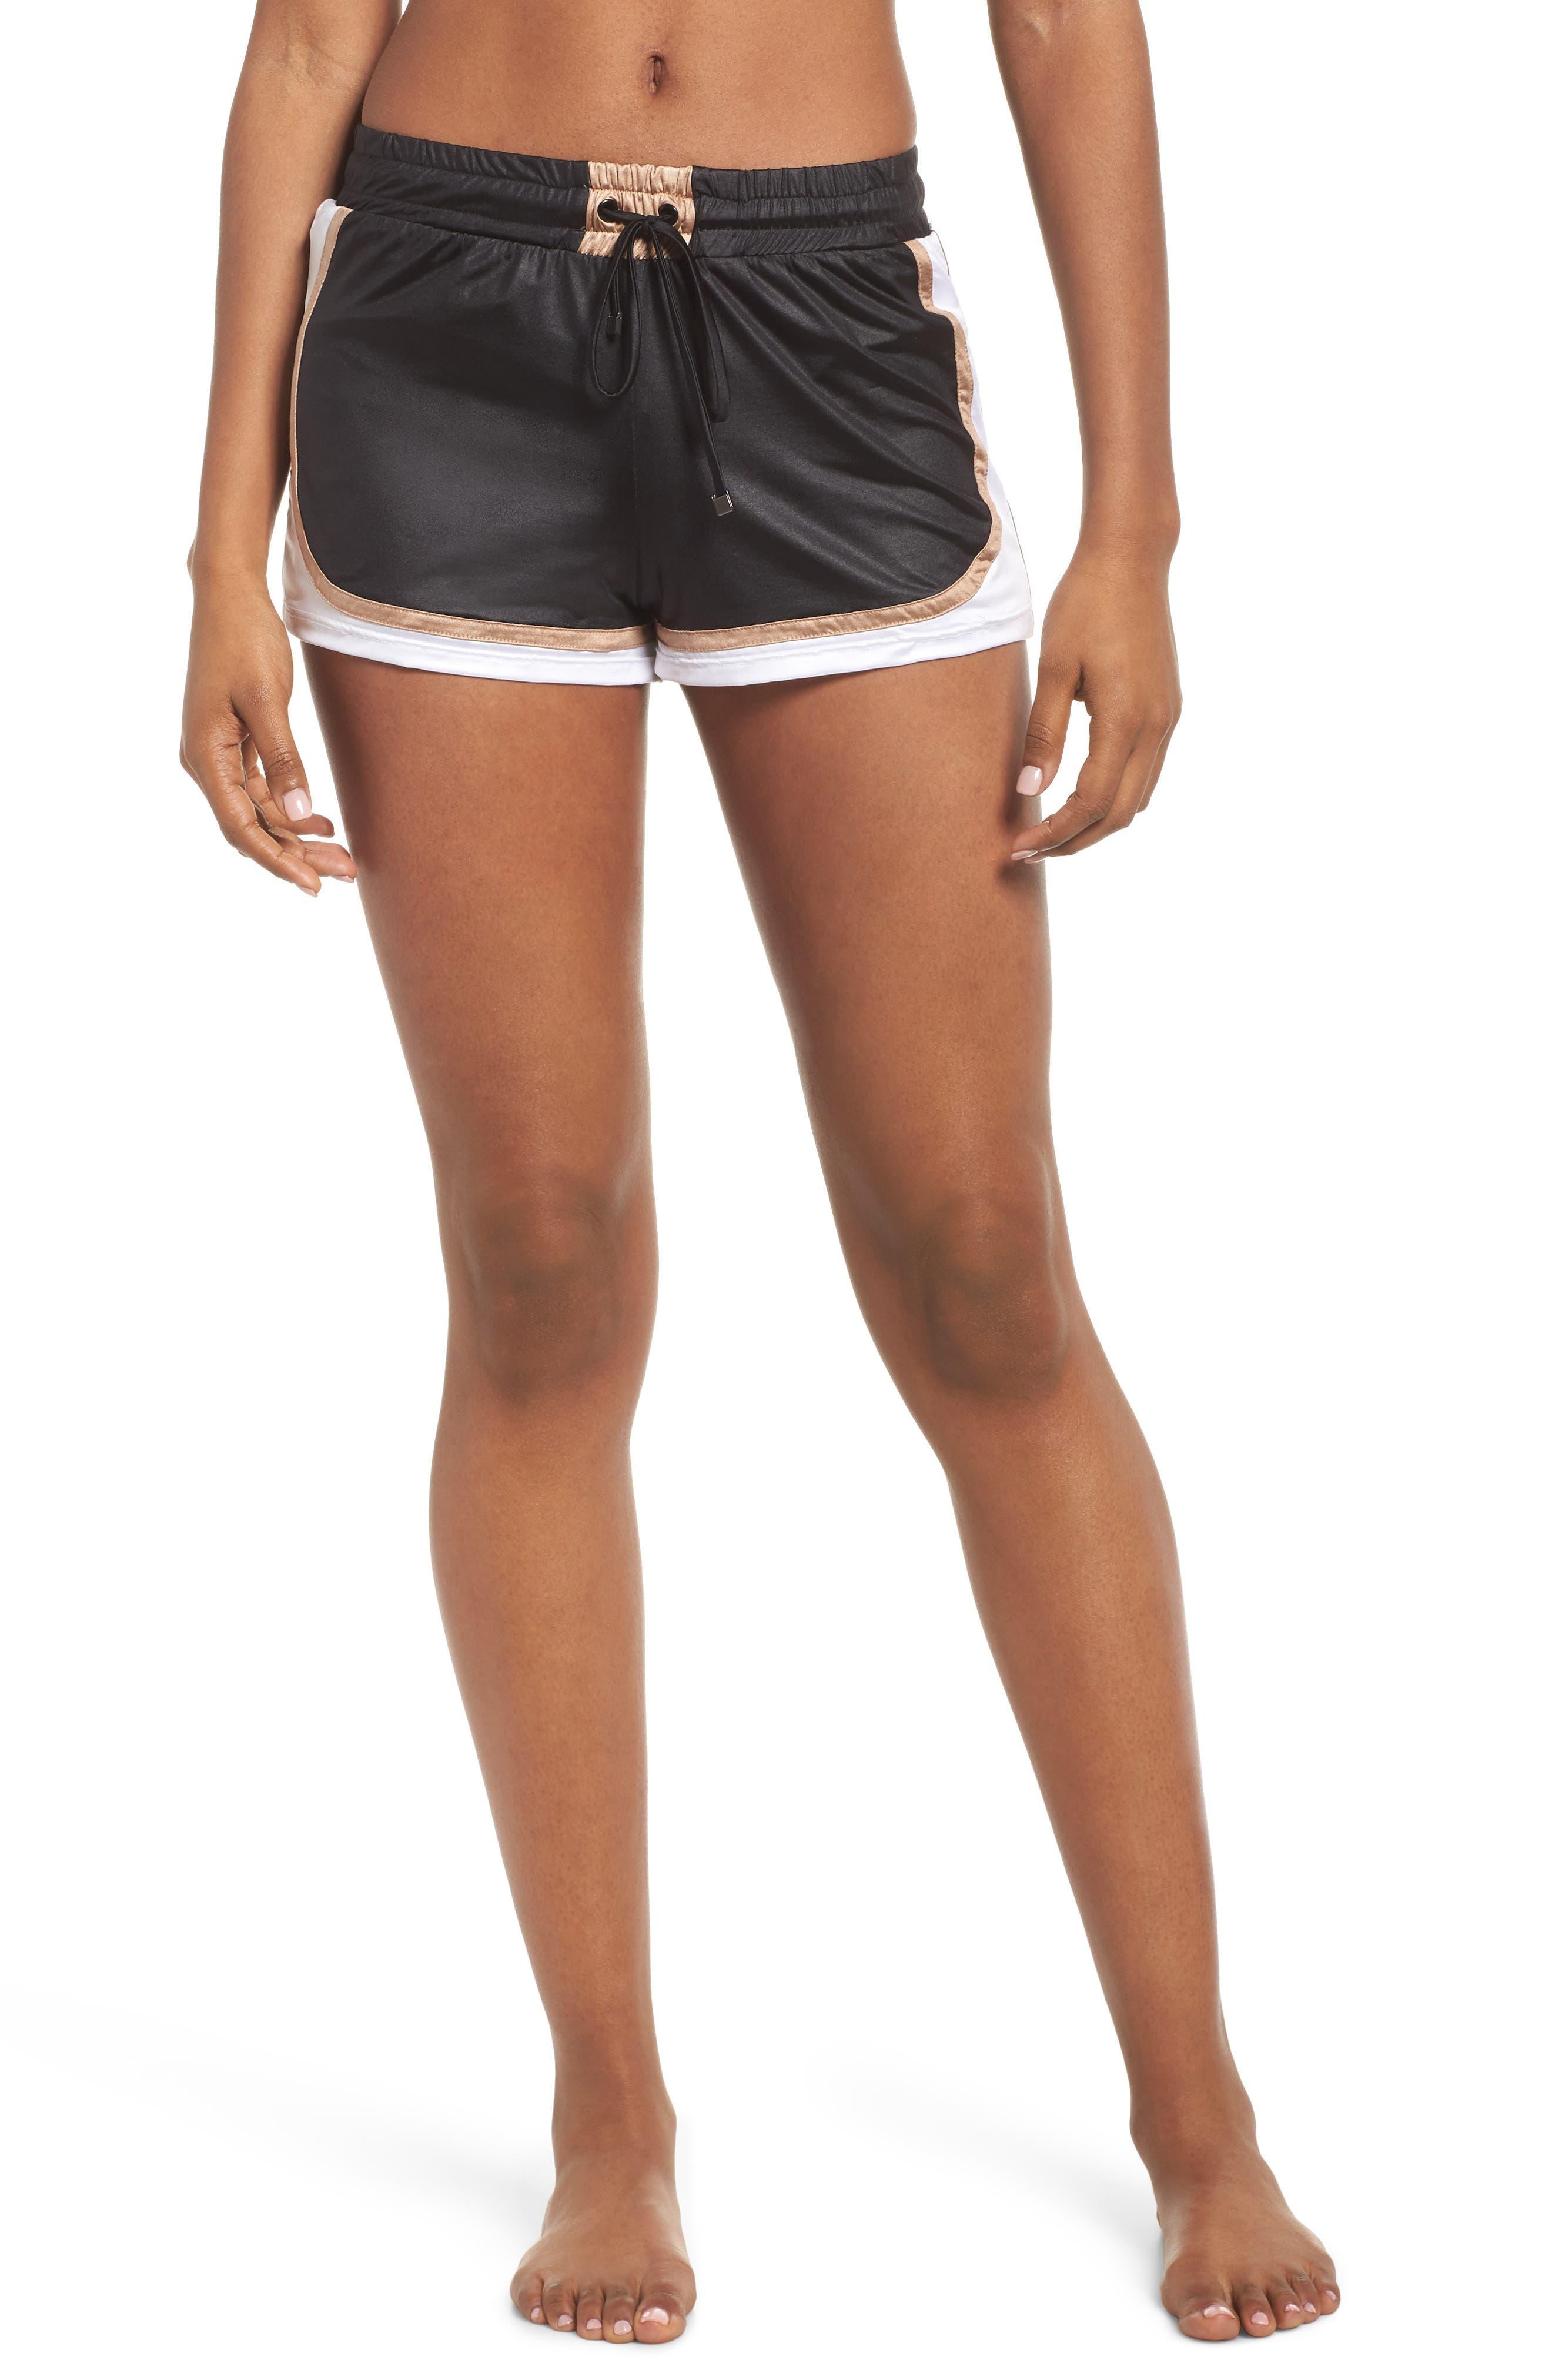 Blackout Shorts,                         Main,                         color, BLACK/ NUDE/ WHITE